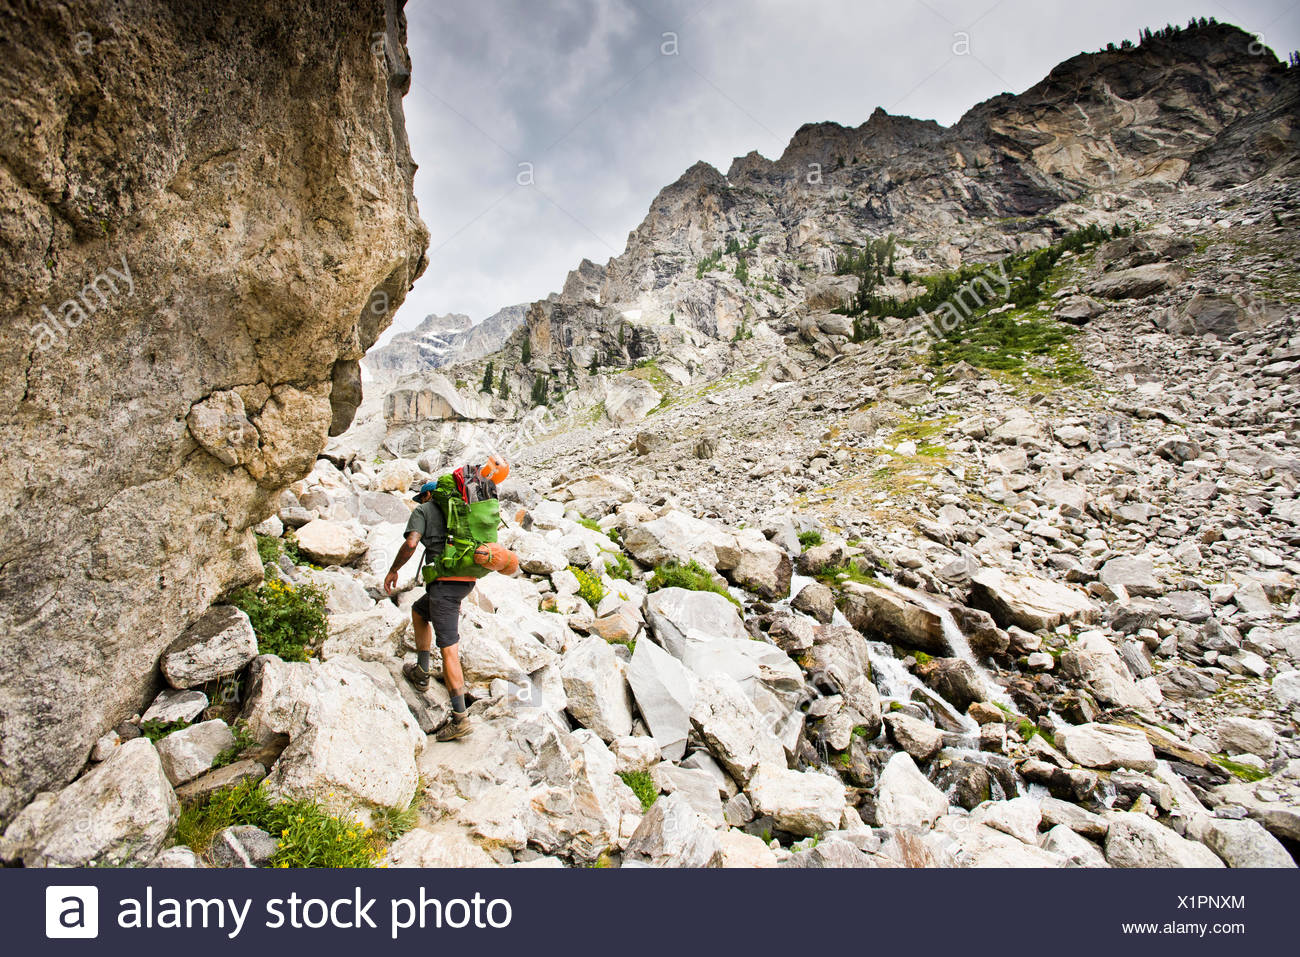 A backpacker going through rocky terrain. - Stock Image